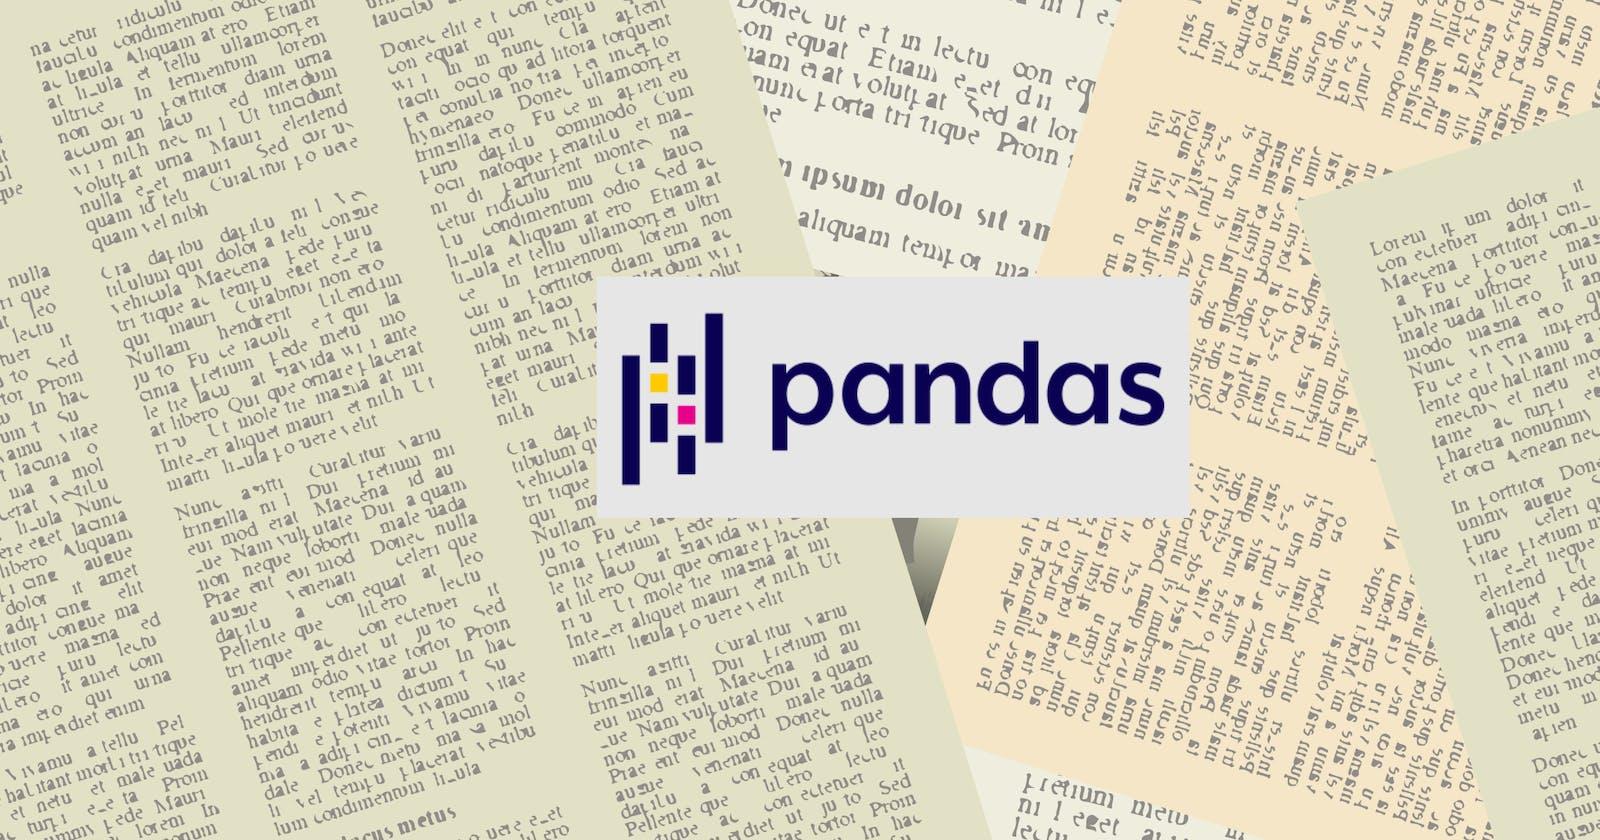 Handling text data with Pandas